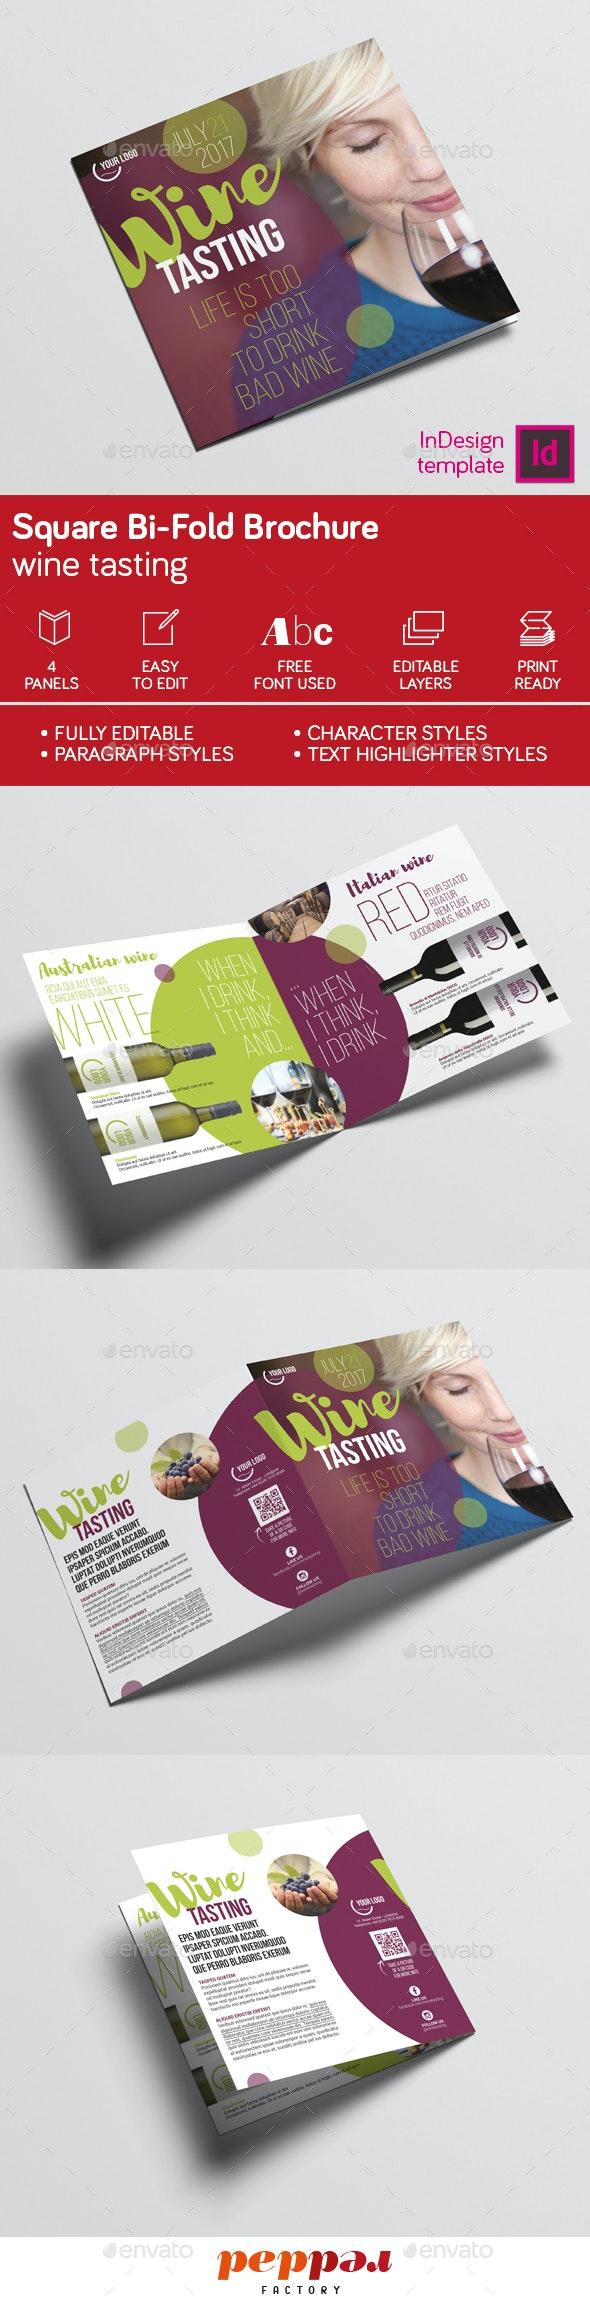 Wine Square Bi-Fold Brochure - Brochures Print Templates